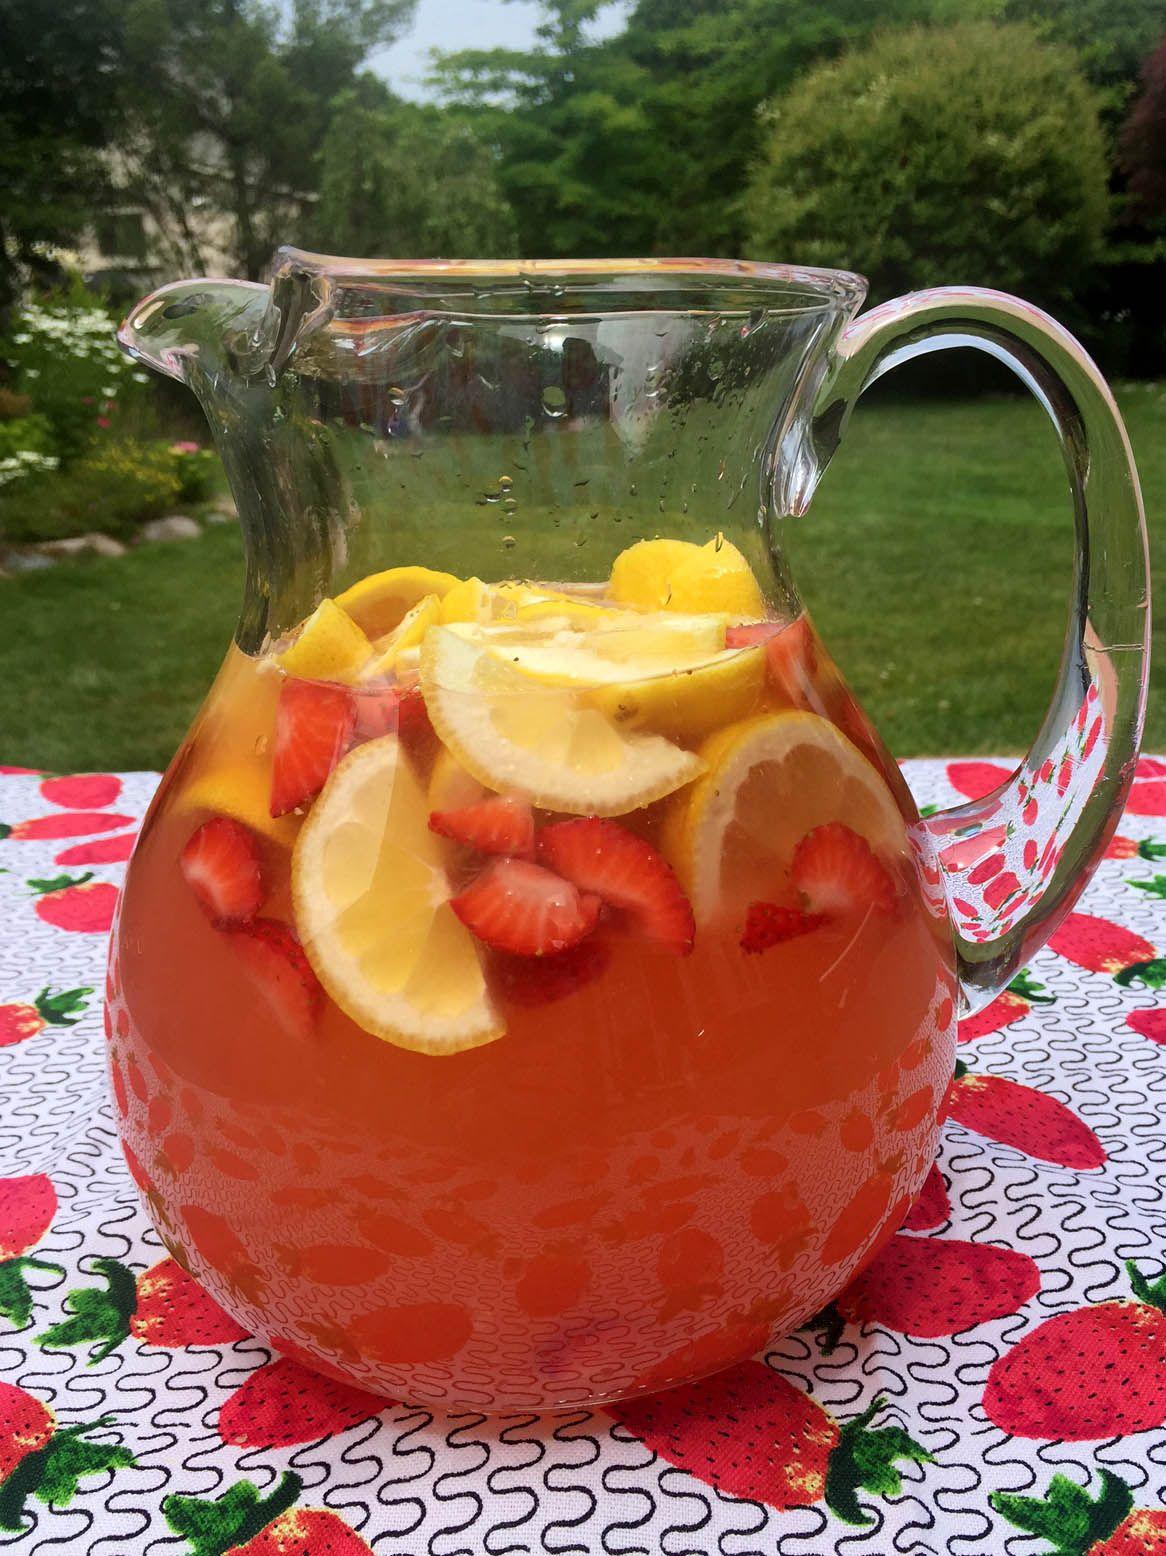 Homemade Strawberry Lemonade Recipe With Freshly Squeezed Lemons & Strawberry Slices